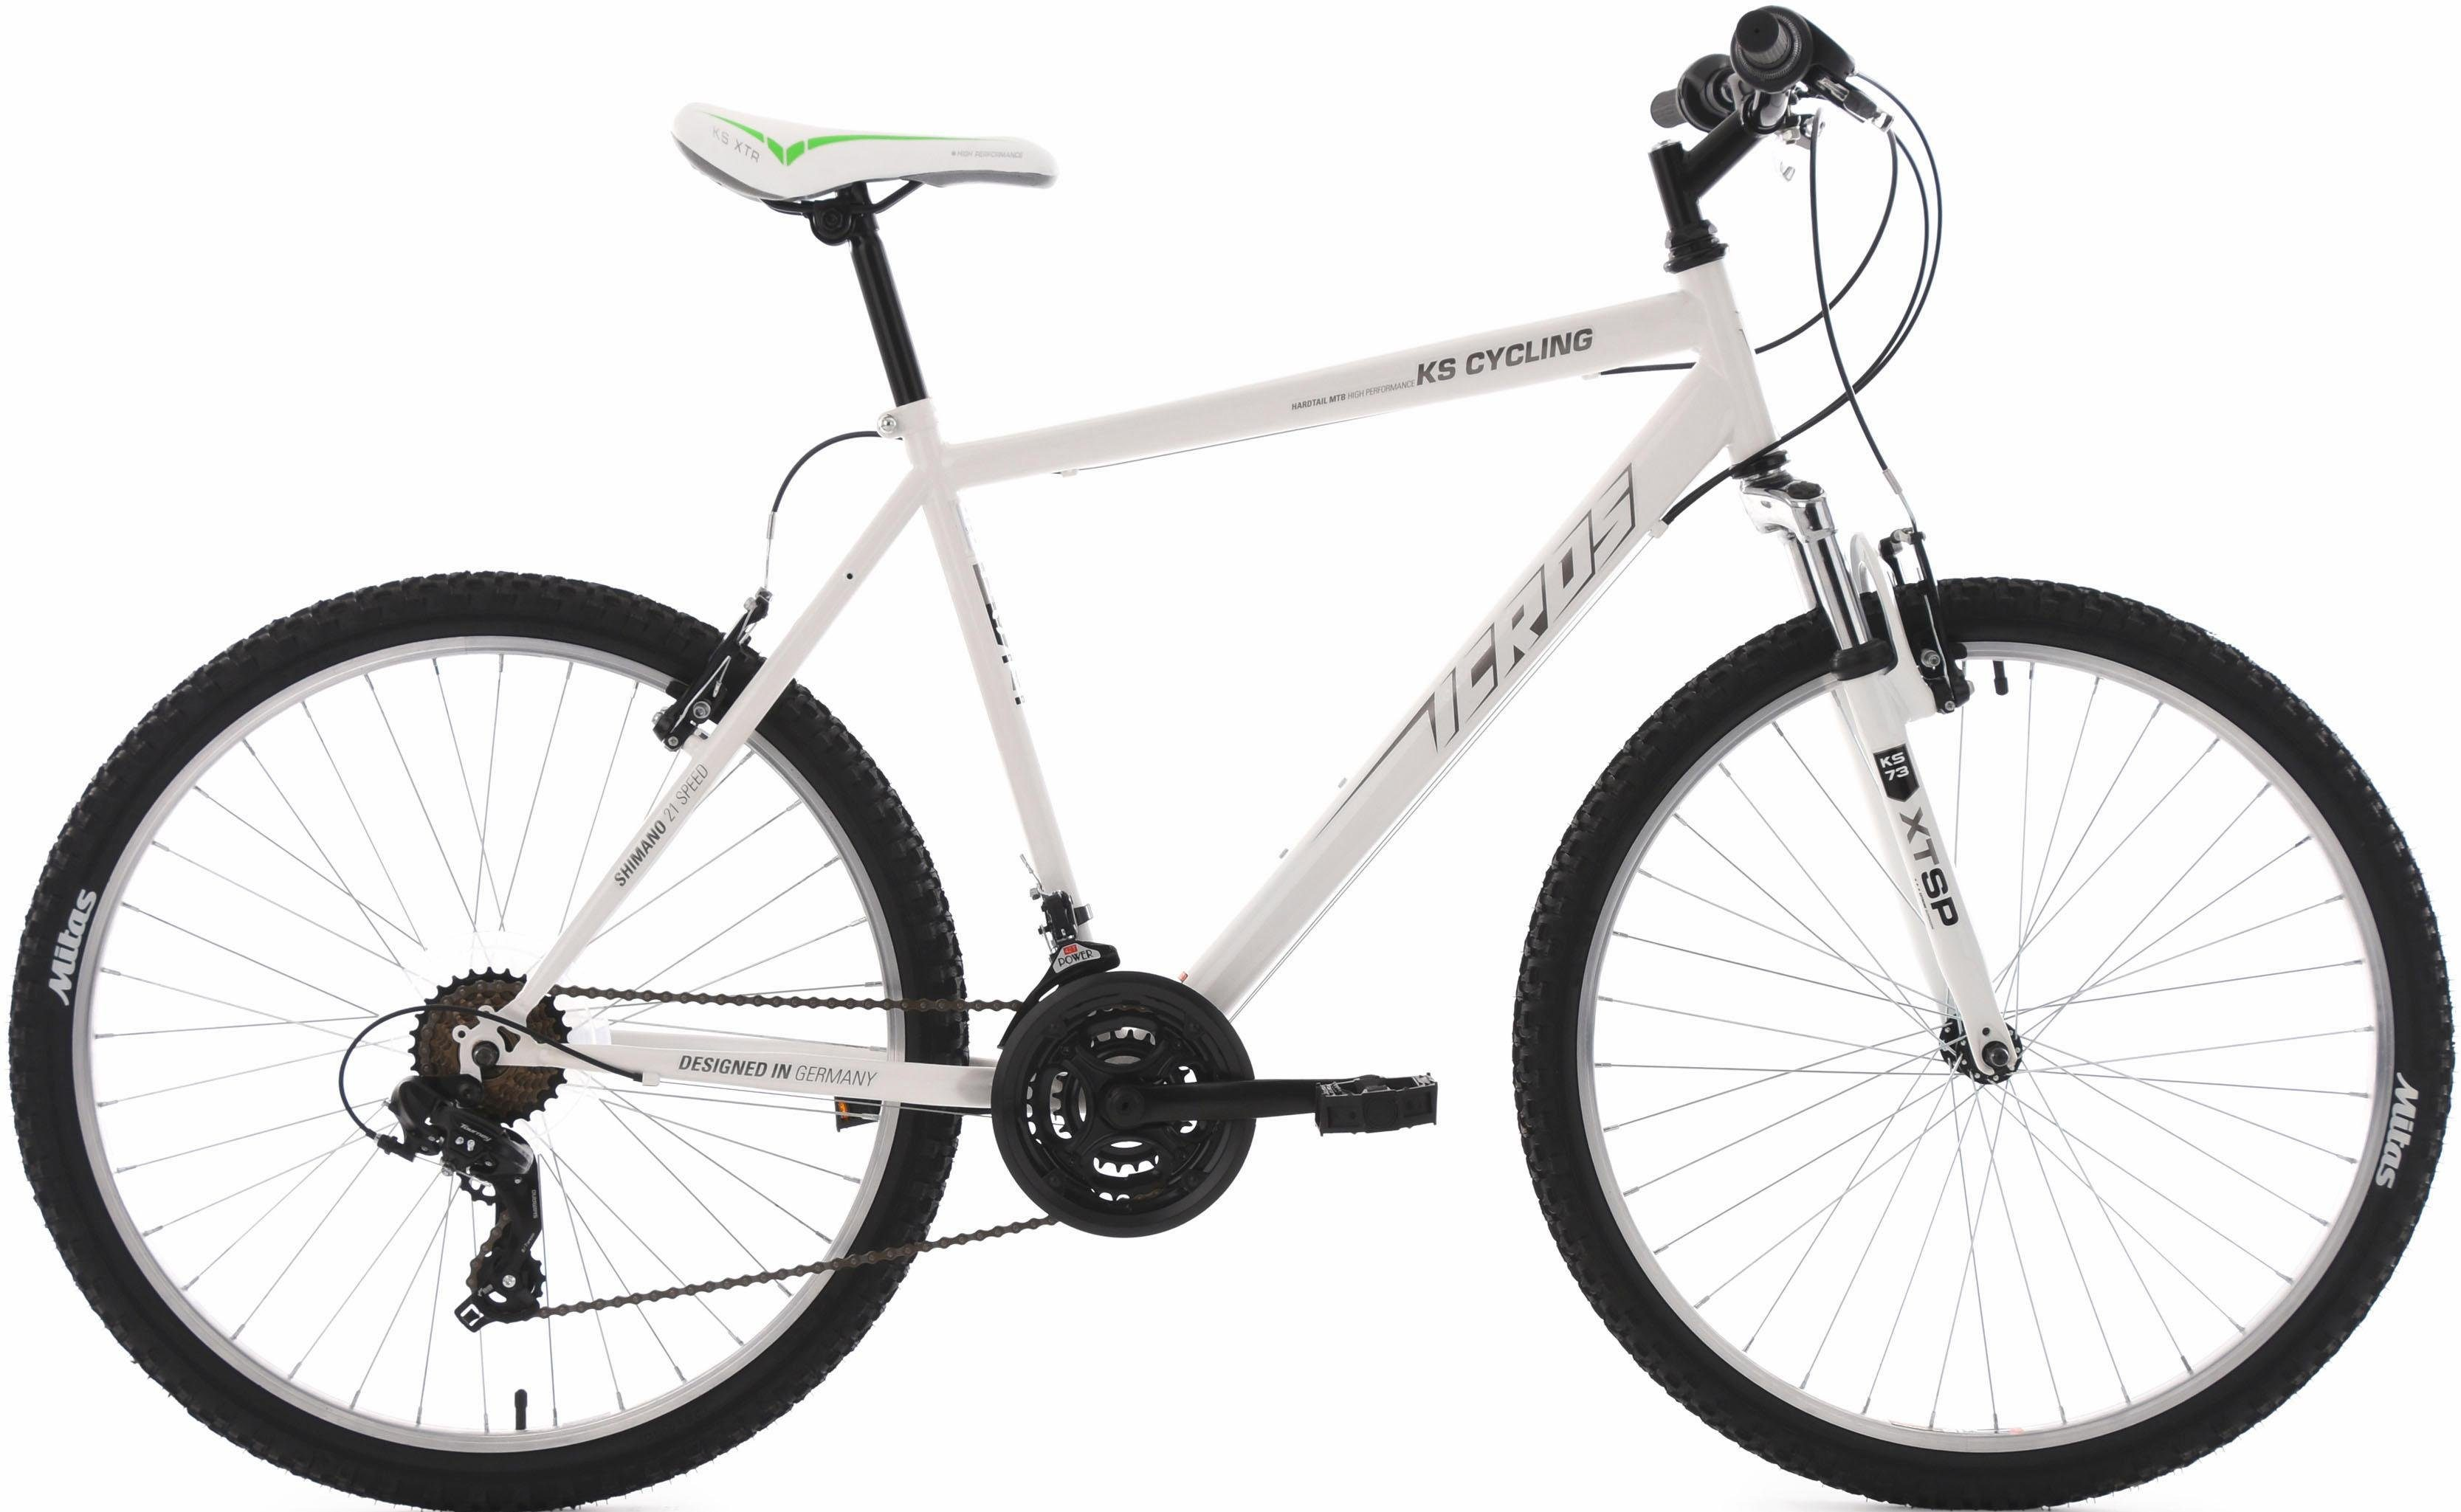 KS Cycling Hardtail-Mountainbike Herren, 26 Zoll, weiß, 21 Gang-Shimano Tourney Schaltwerk, »Icros«